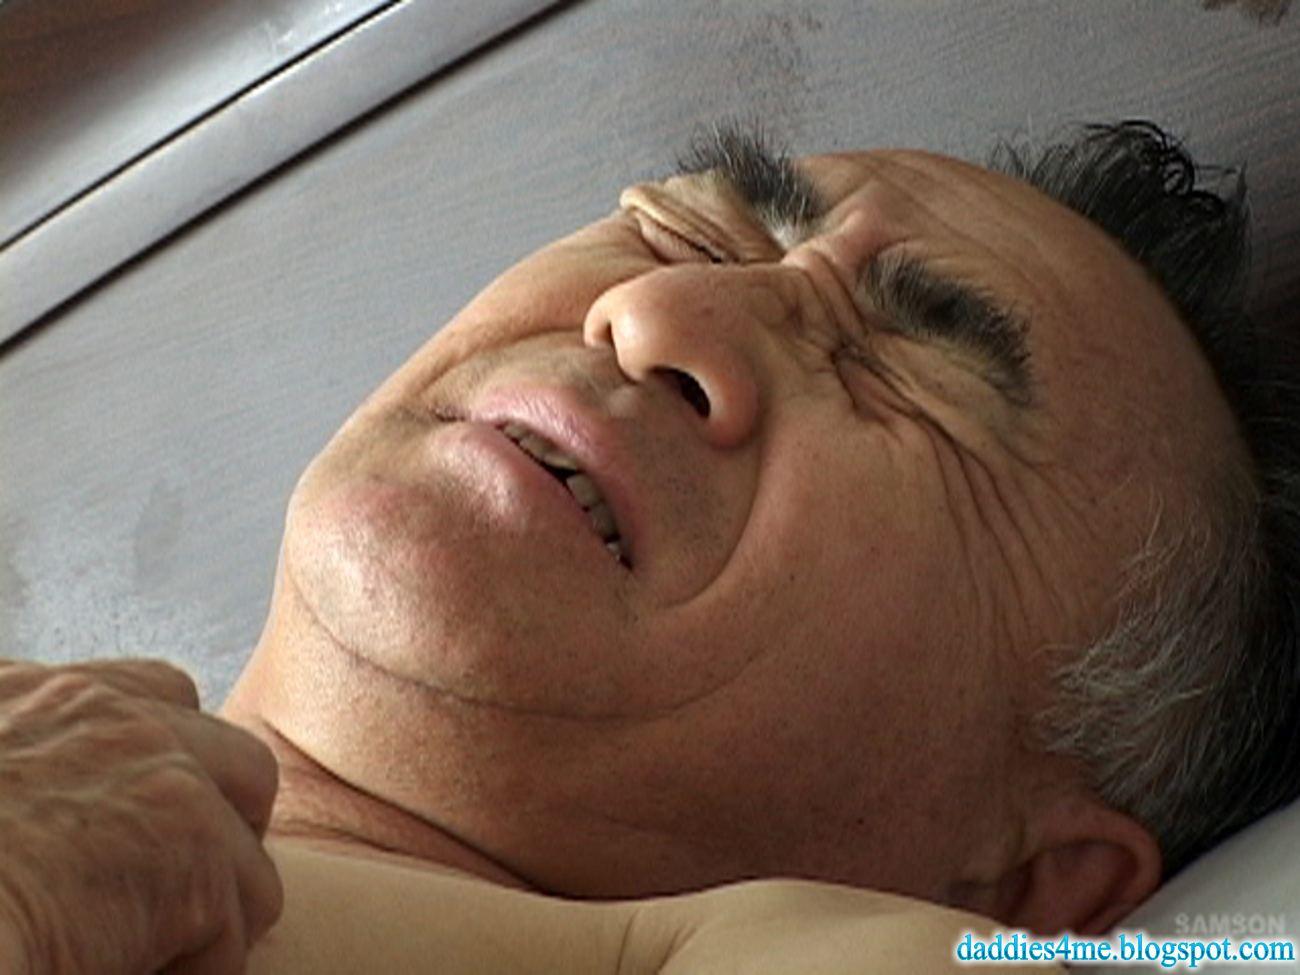 Chubby creampie porn